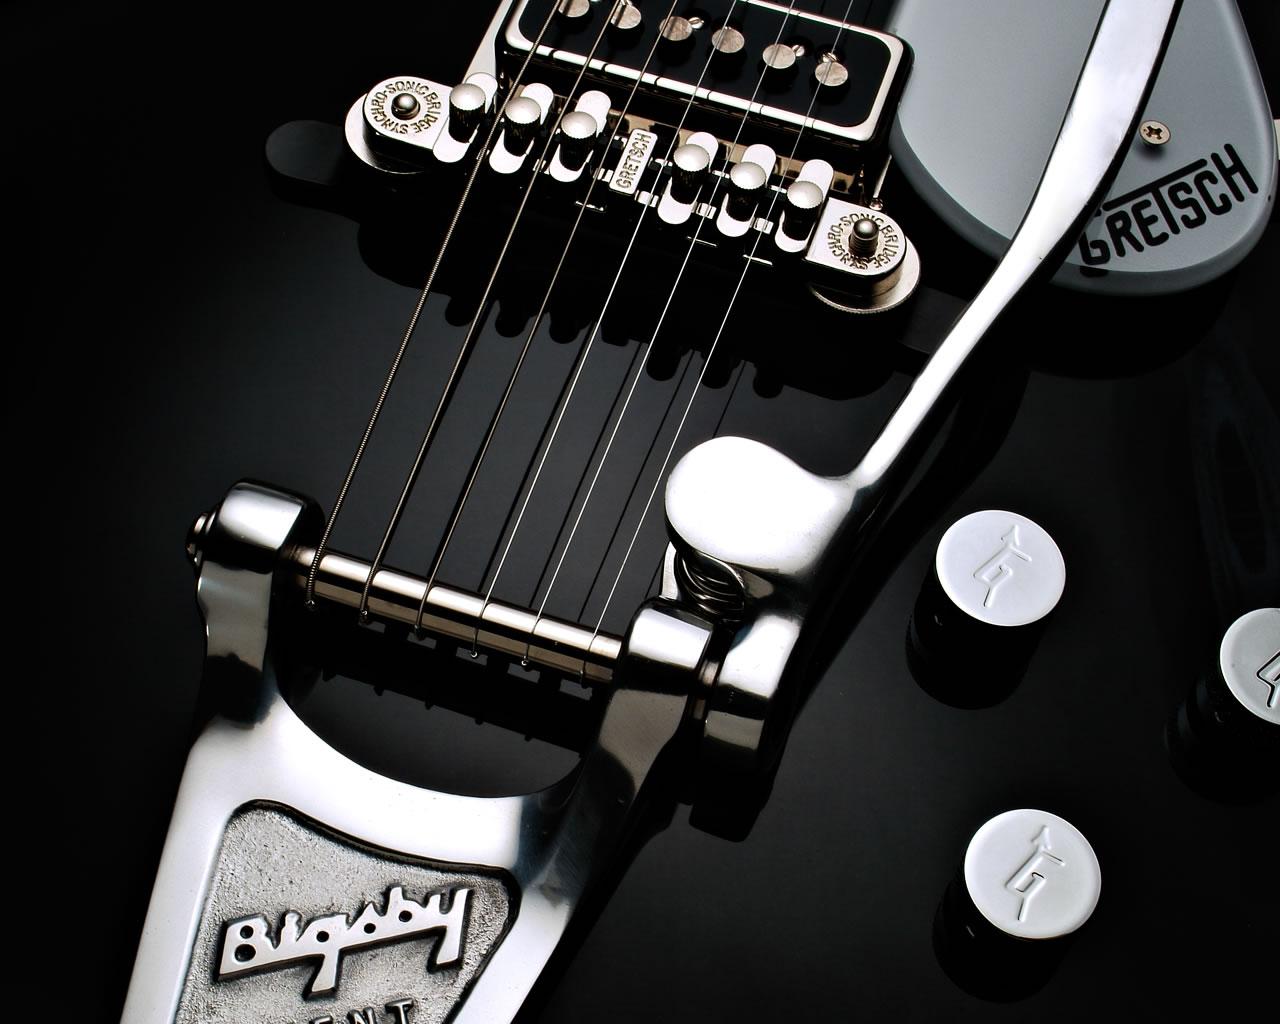 Desktop Wallpaper: Bigsby Gretsch Black Guitar Desktop